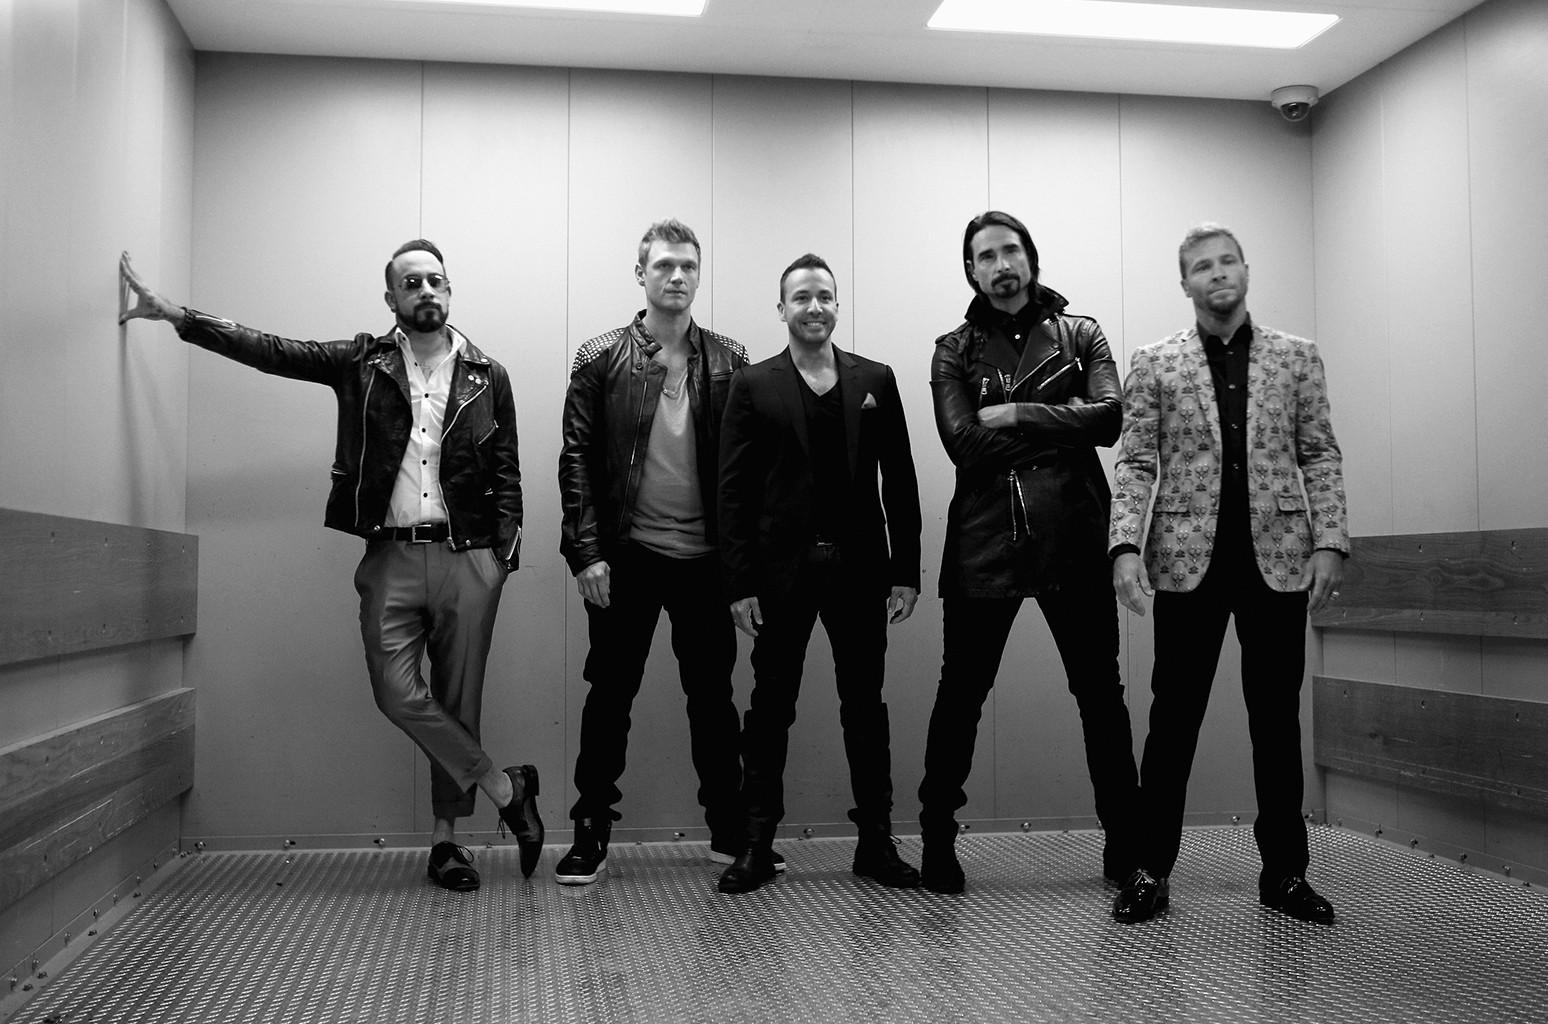 Backstreet Boys attend the 2016 iHeartRadio Music Festival